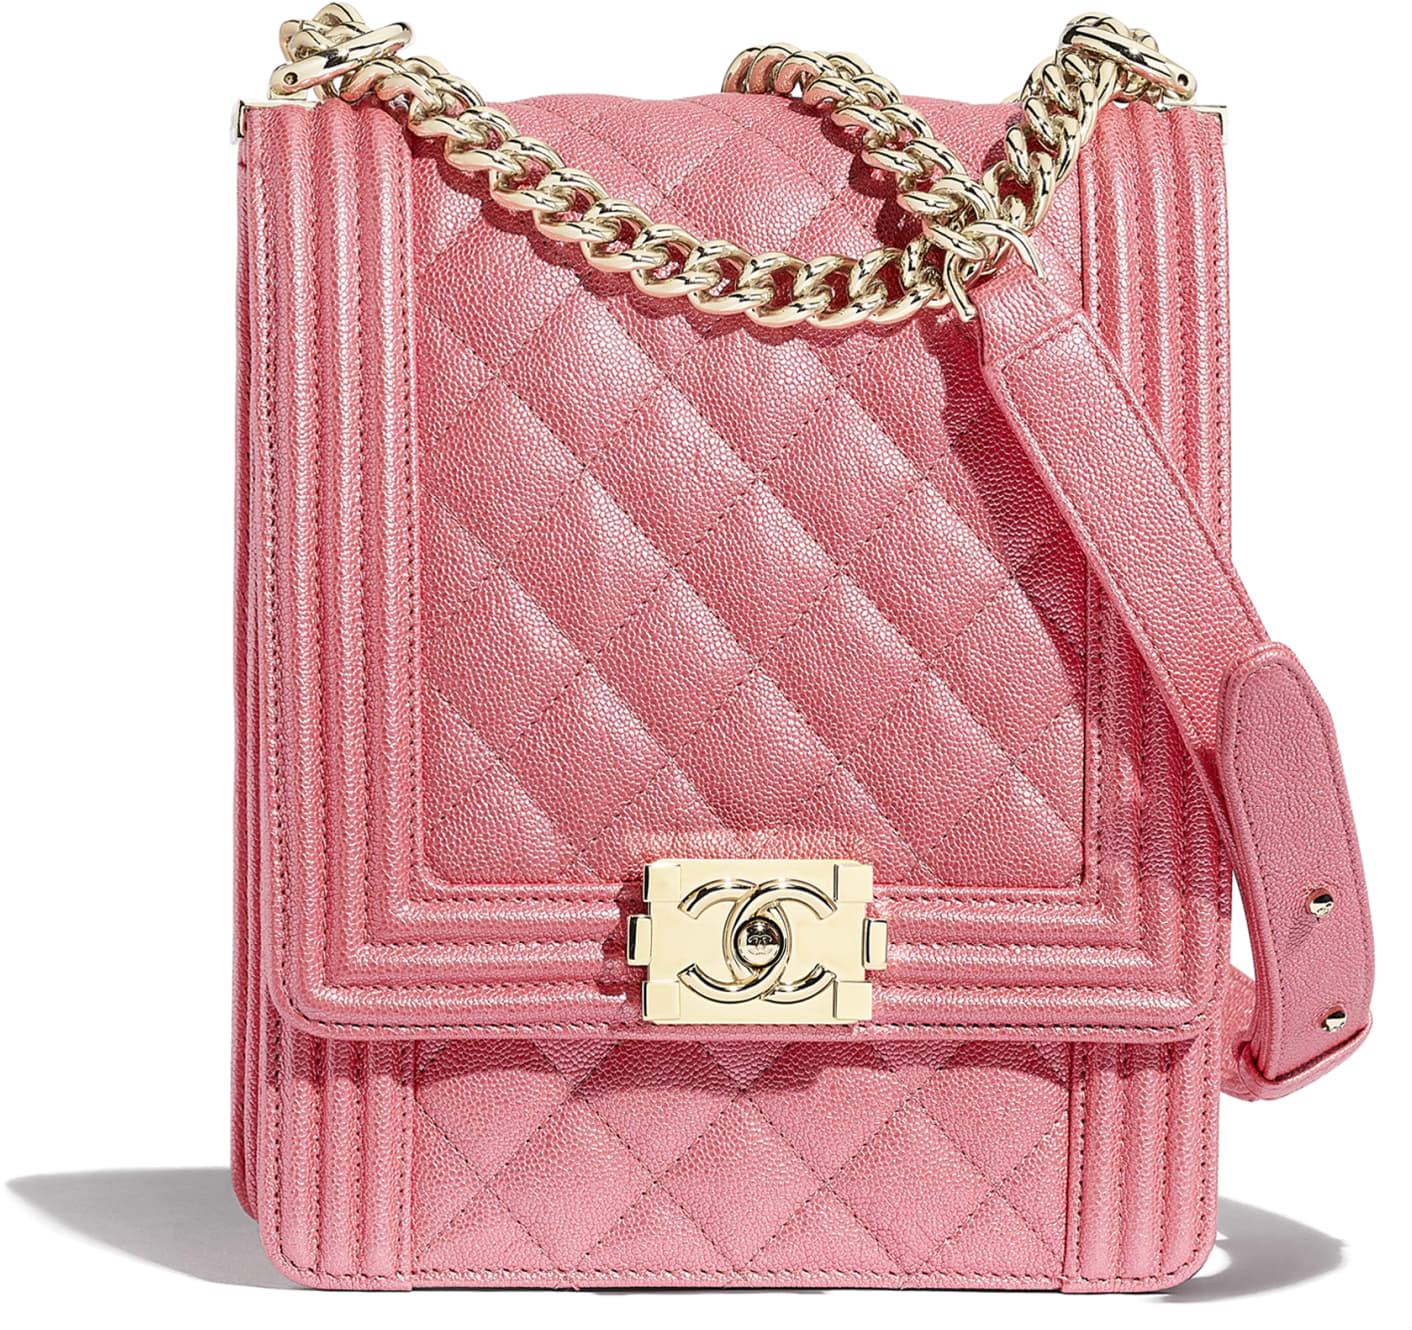 Borsa Boy Chanel in pelle martellata rosa